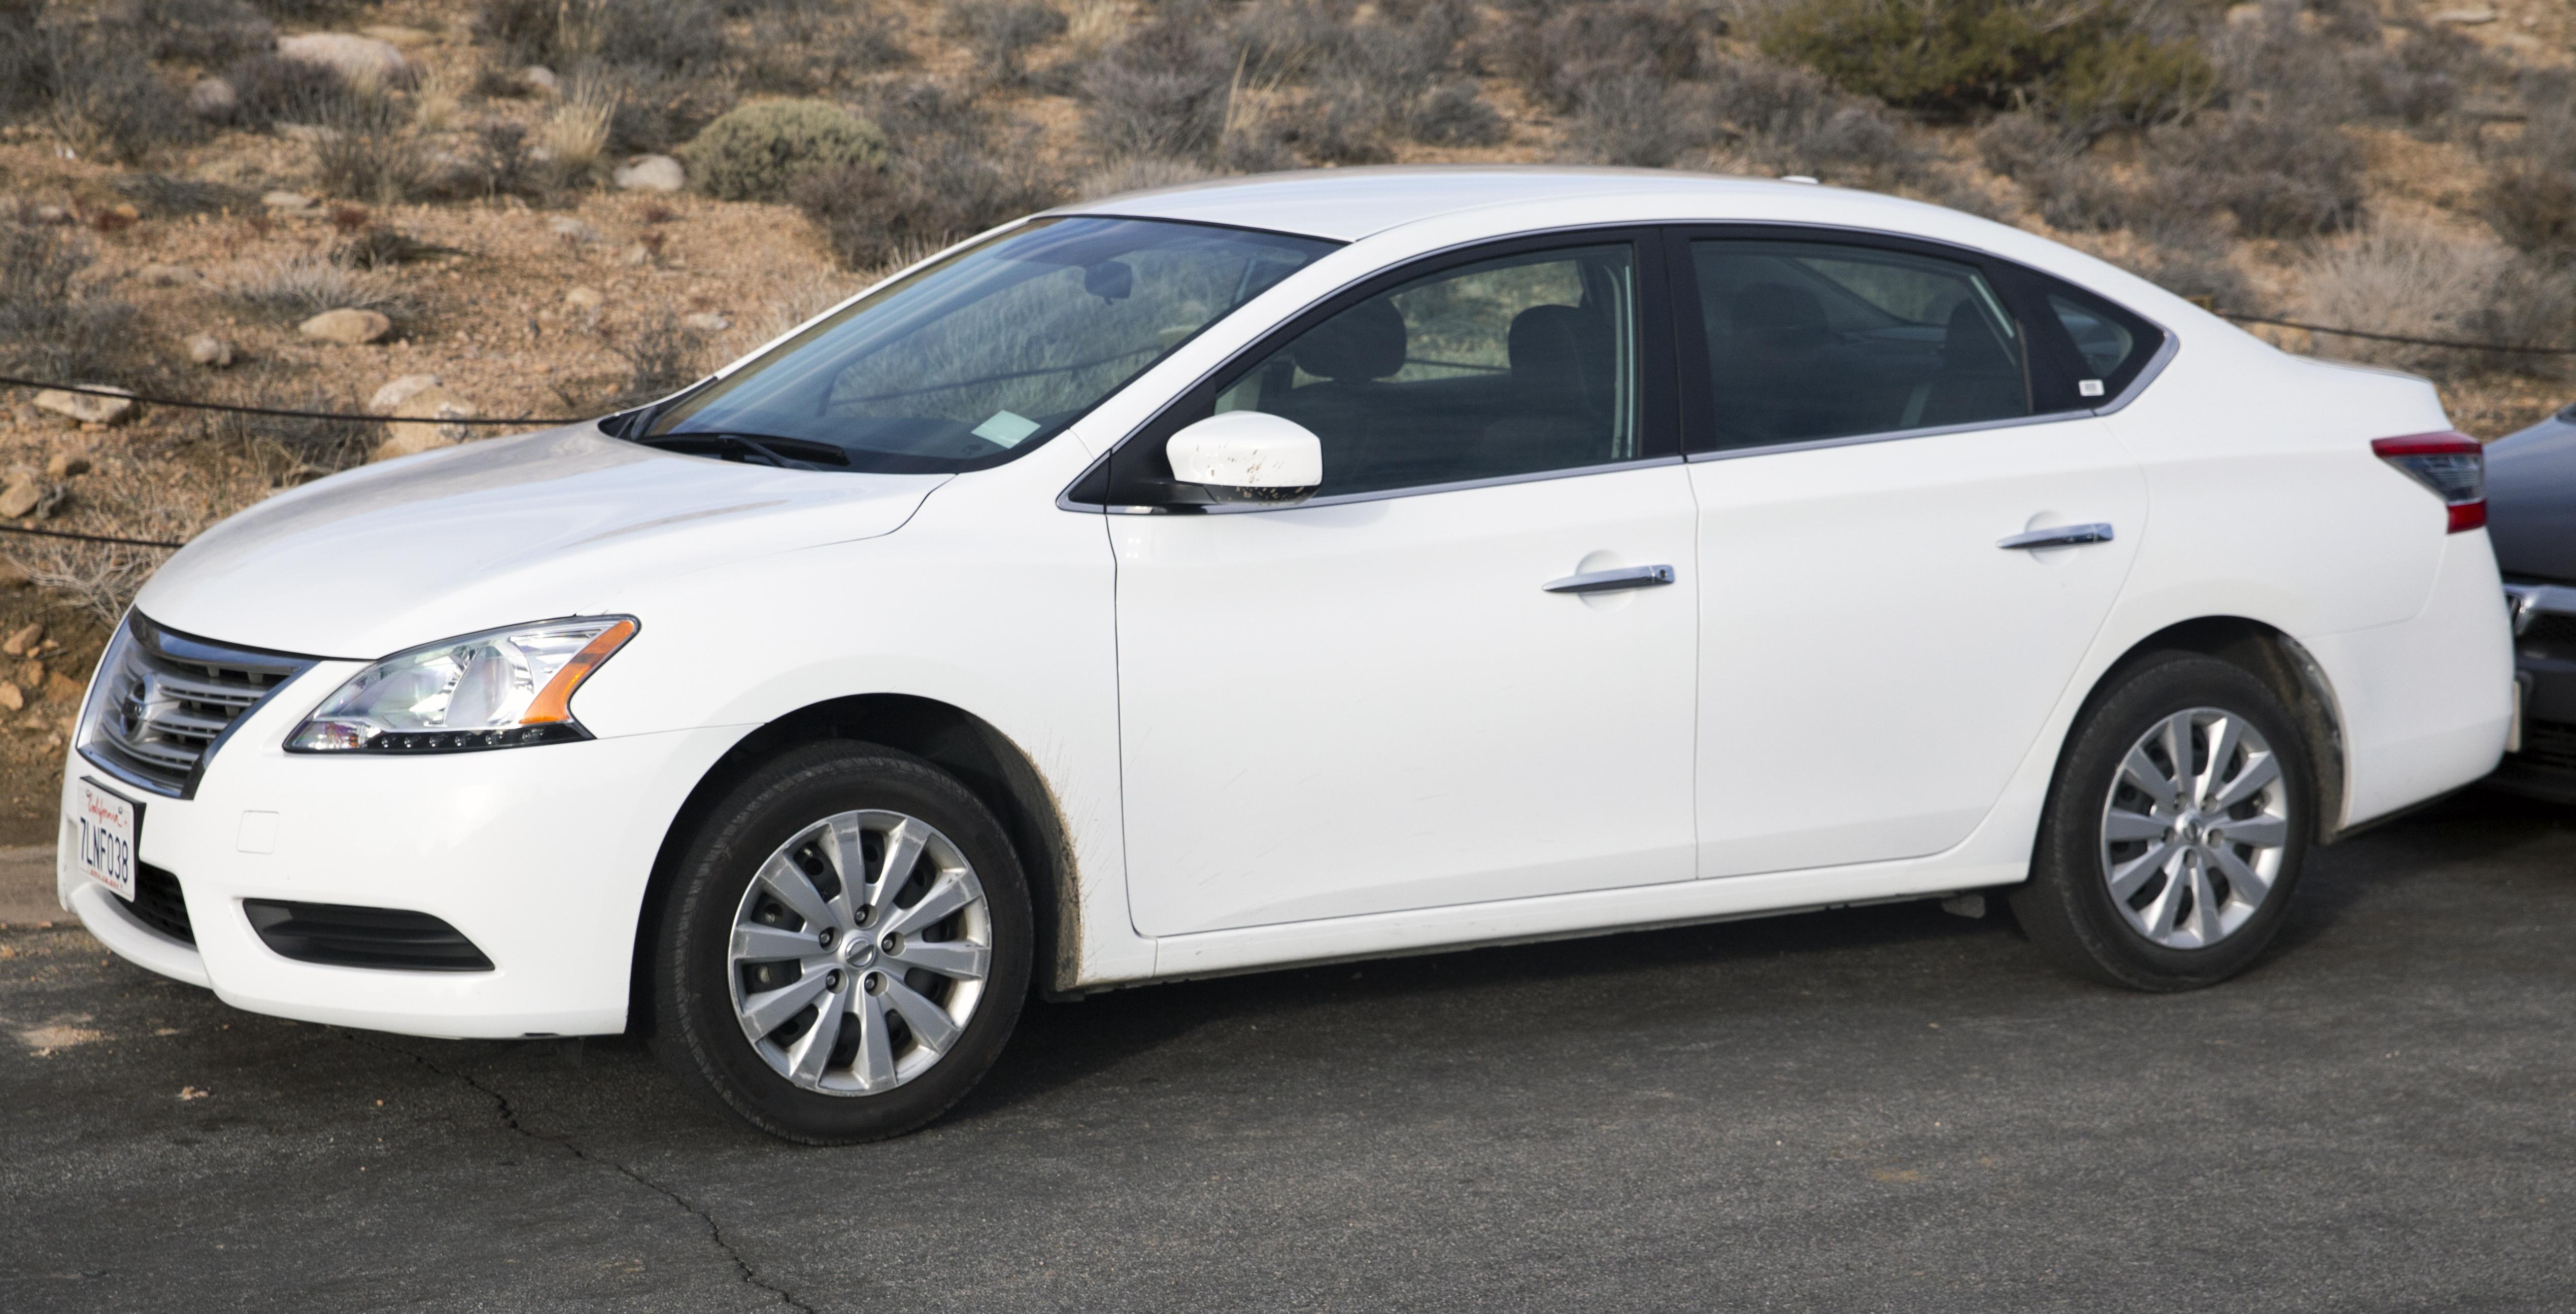 Nissan Sentra VII (B17) 2012 - now Sedan #4